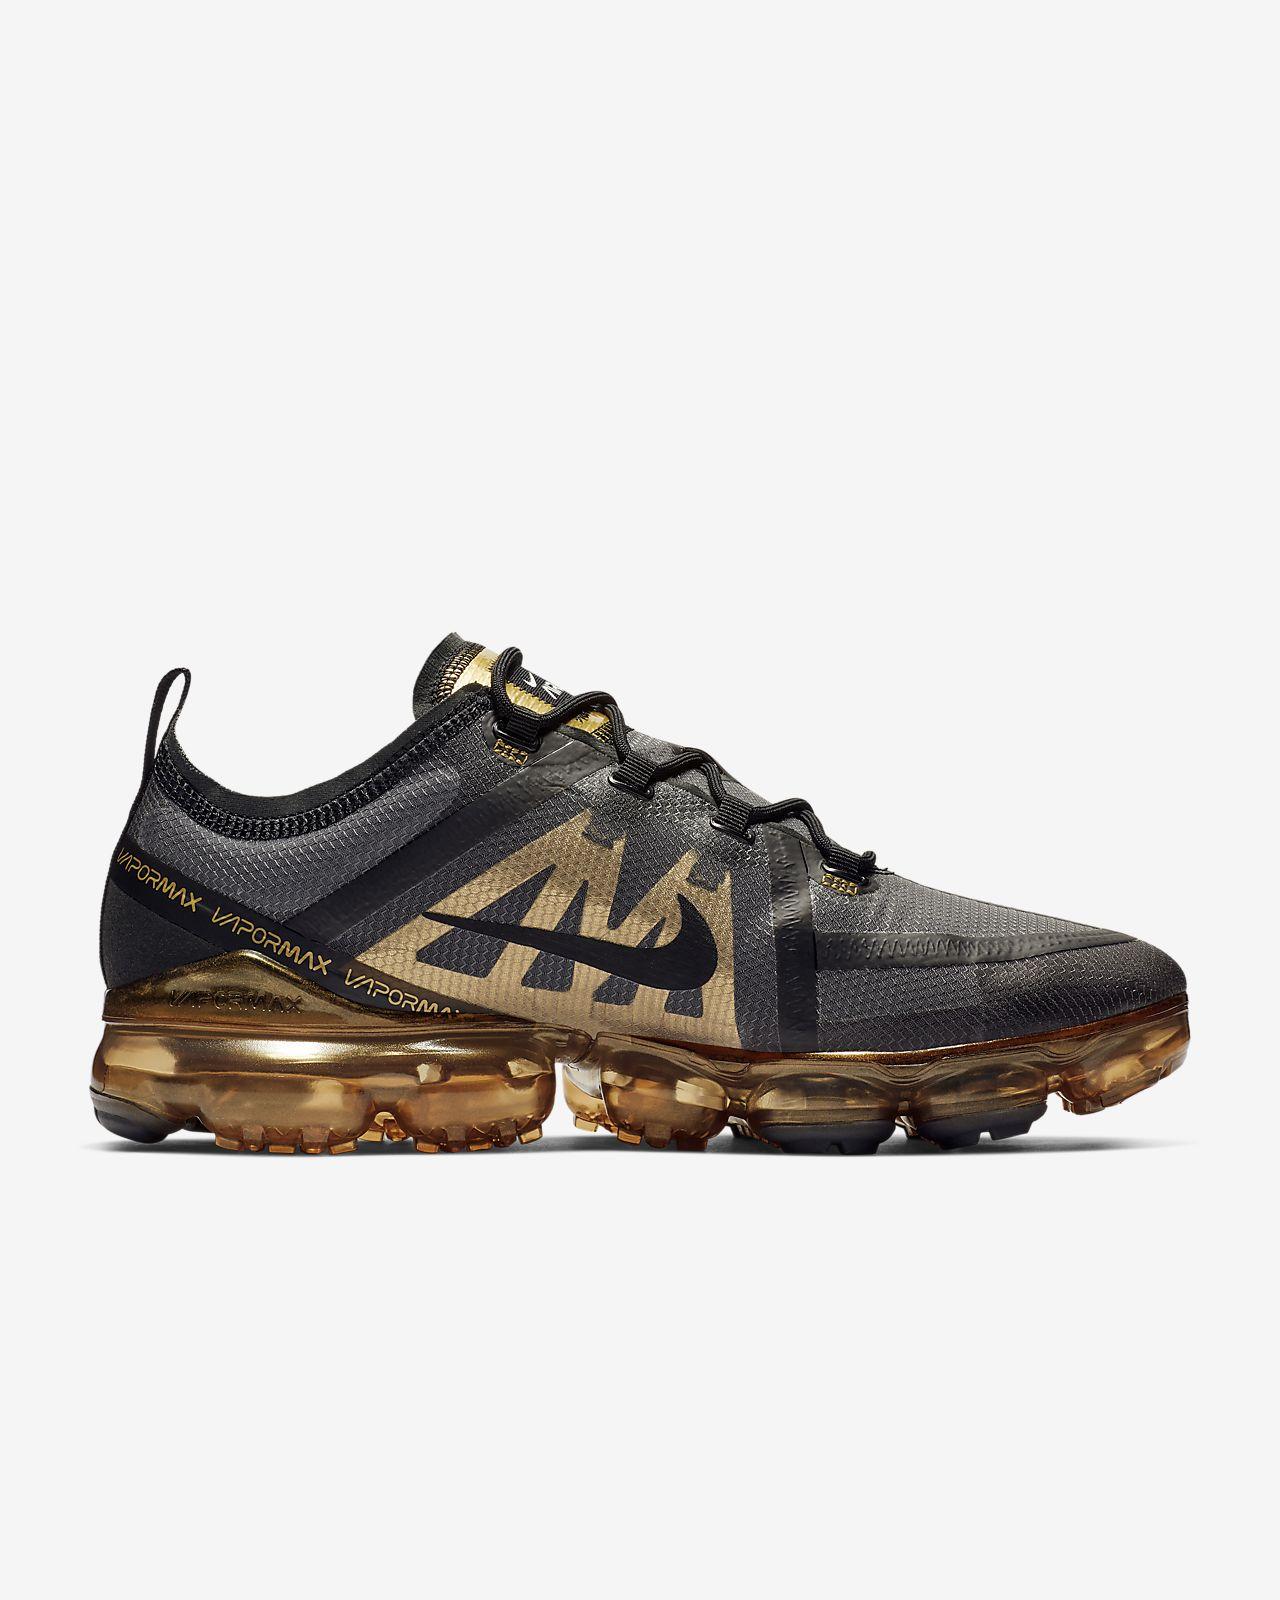 f7c8859048293 Nike Air VaporMax 2019 Shoe. ID nike vapormax 2019 id